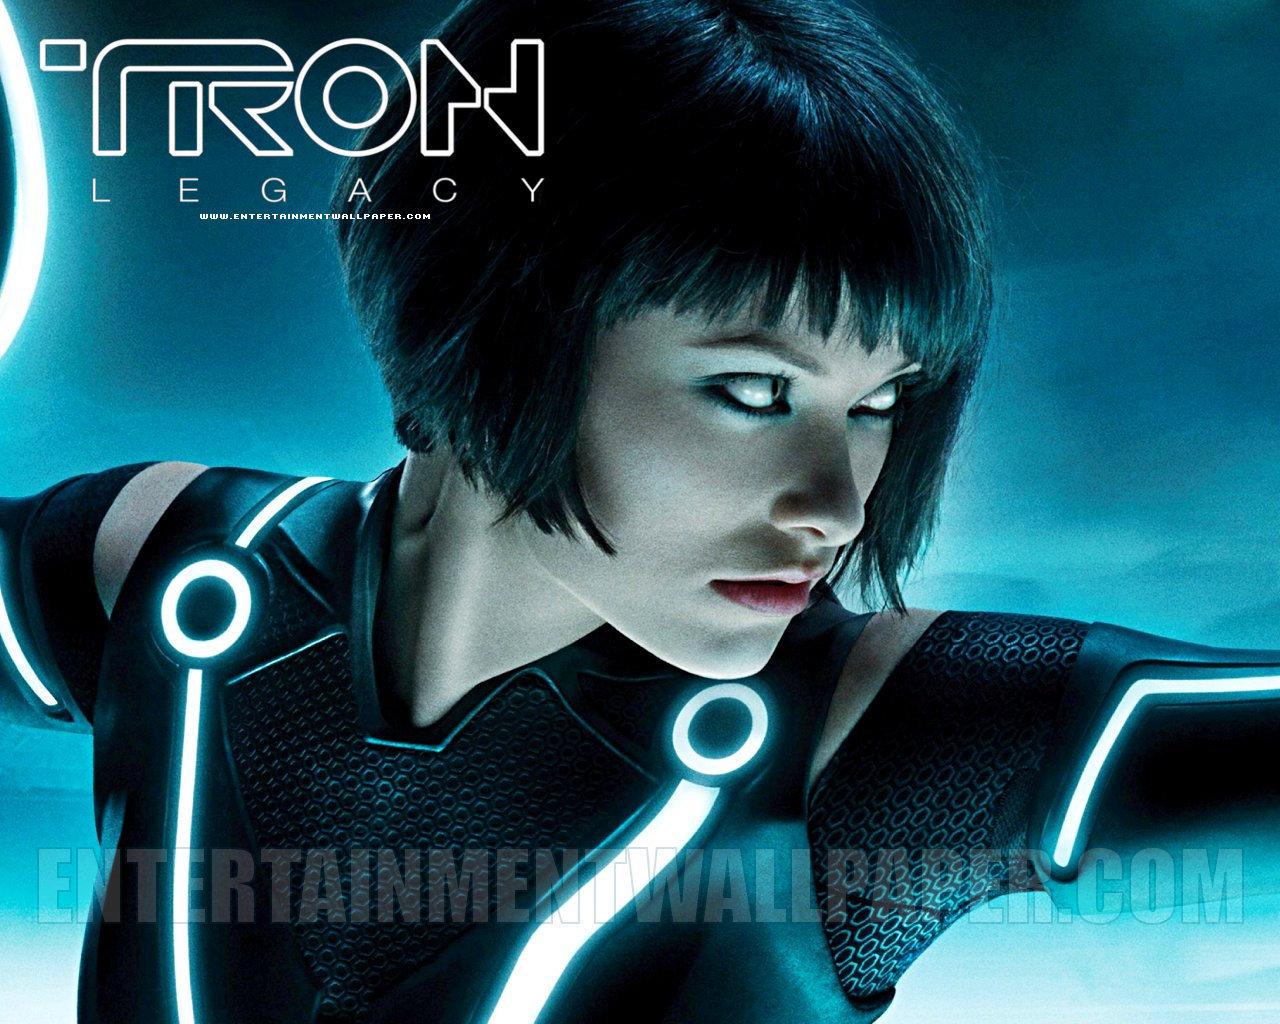 tron legacy 2010 upcoming movies wallpaper 17301817